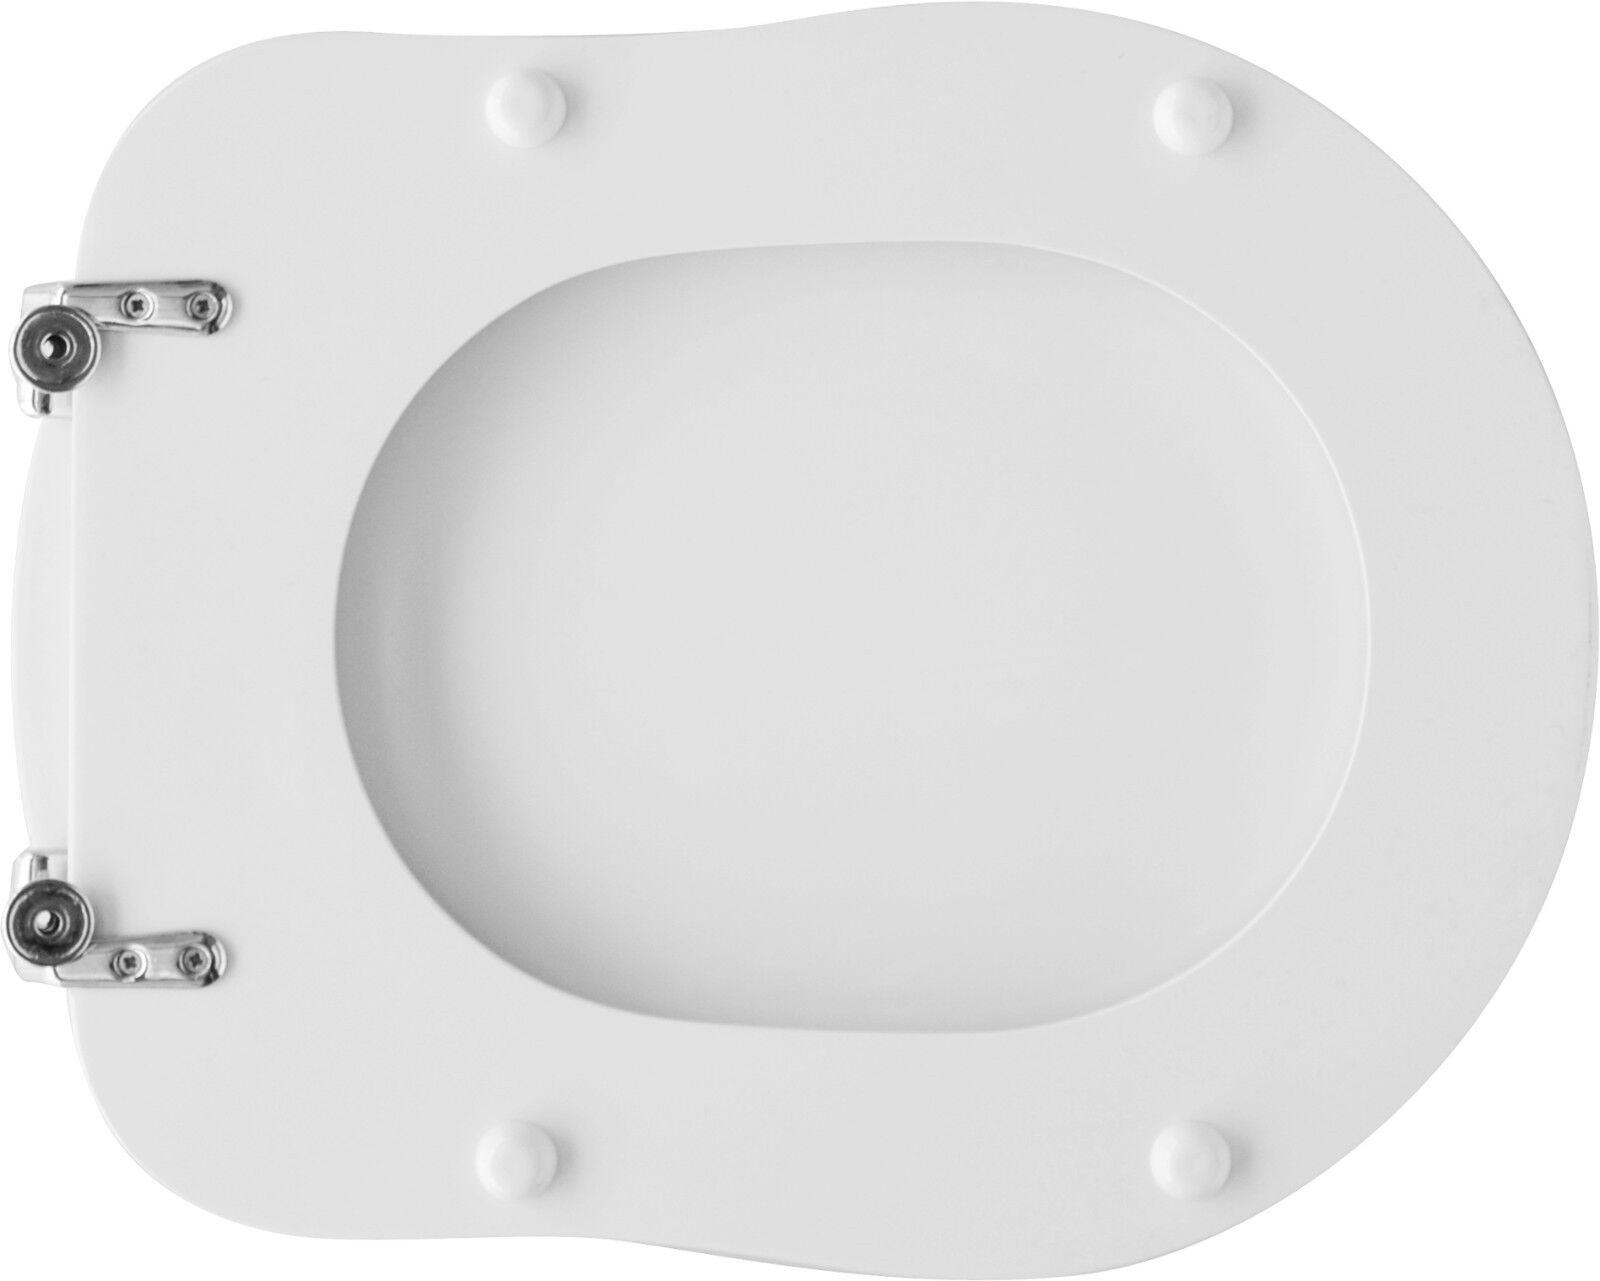 COUVRE SIÈGE SIÈGE WC WC WC P/DOLOMITE VASE ANTALYA BLANC | Moderne  b6d77a